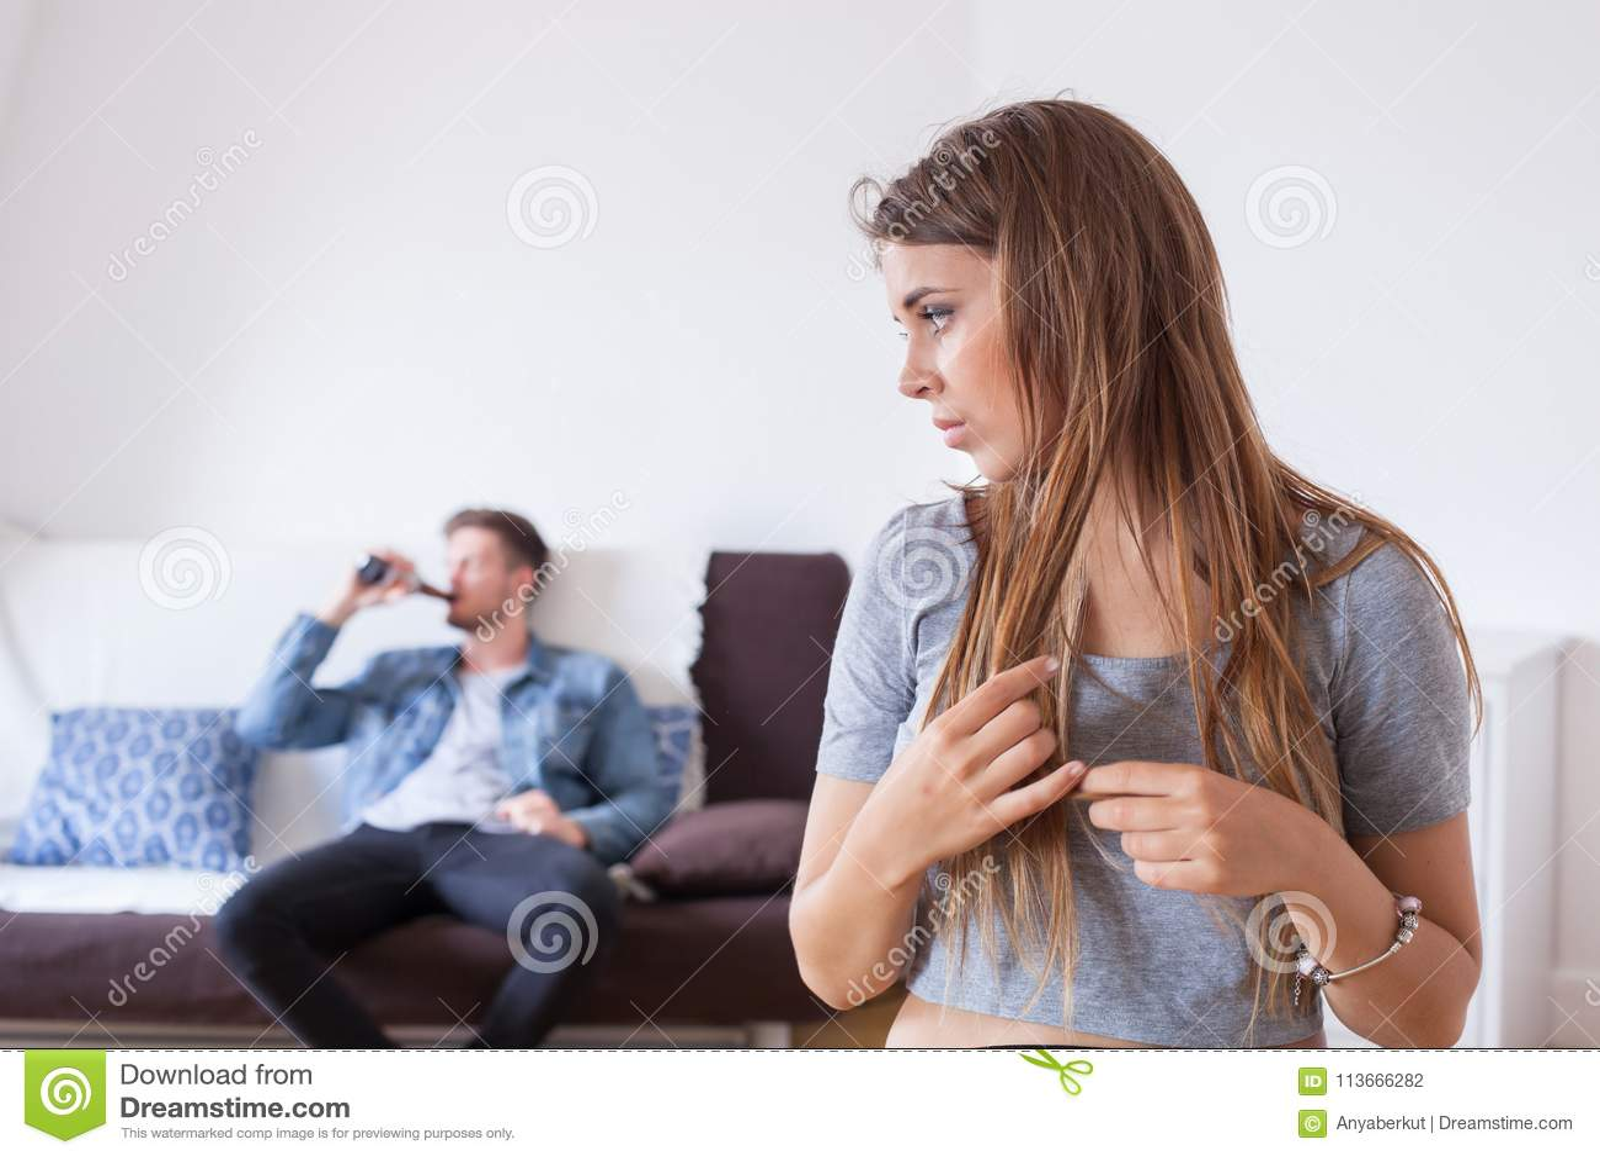 single dating service